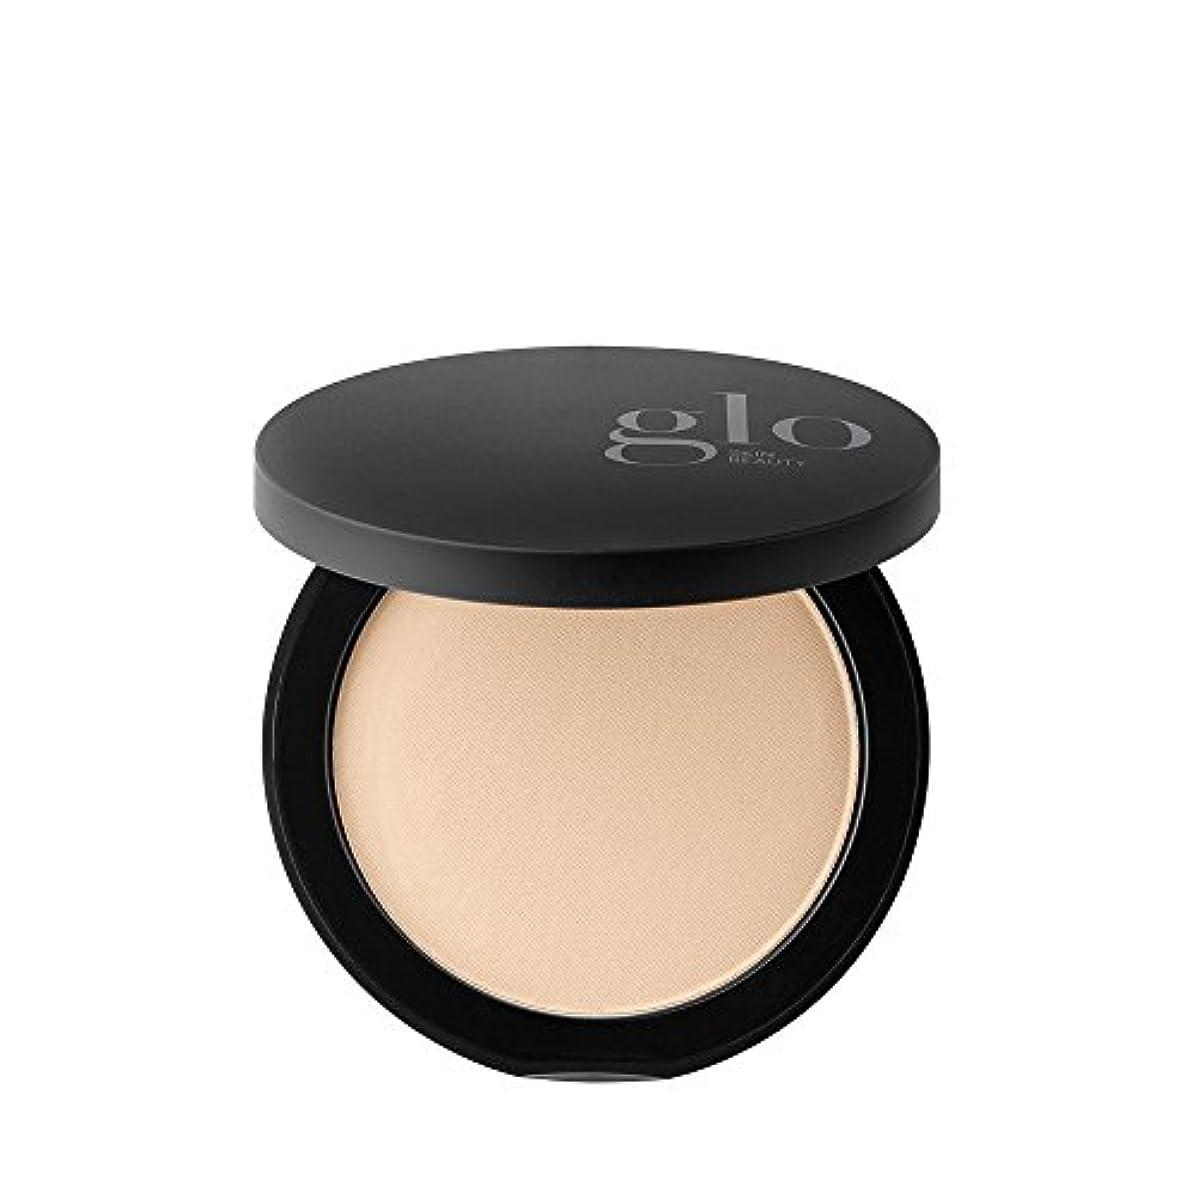 Glo Skin Beauty Pressed Base - # Natural Fair 9g/0.31oz並行輸入品